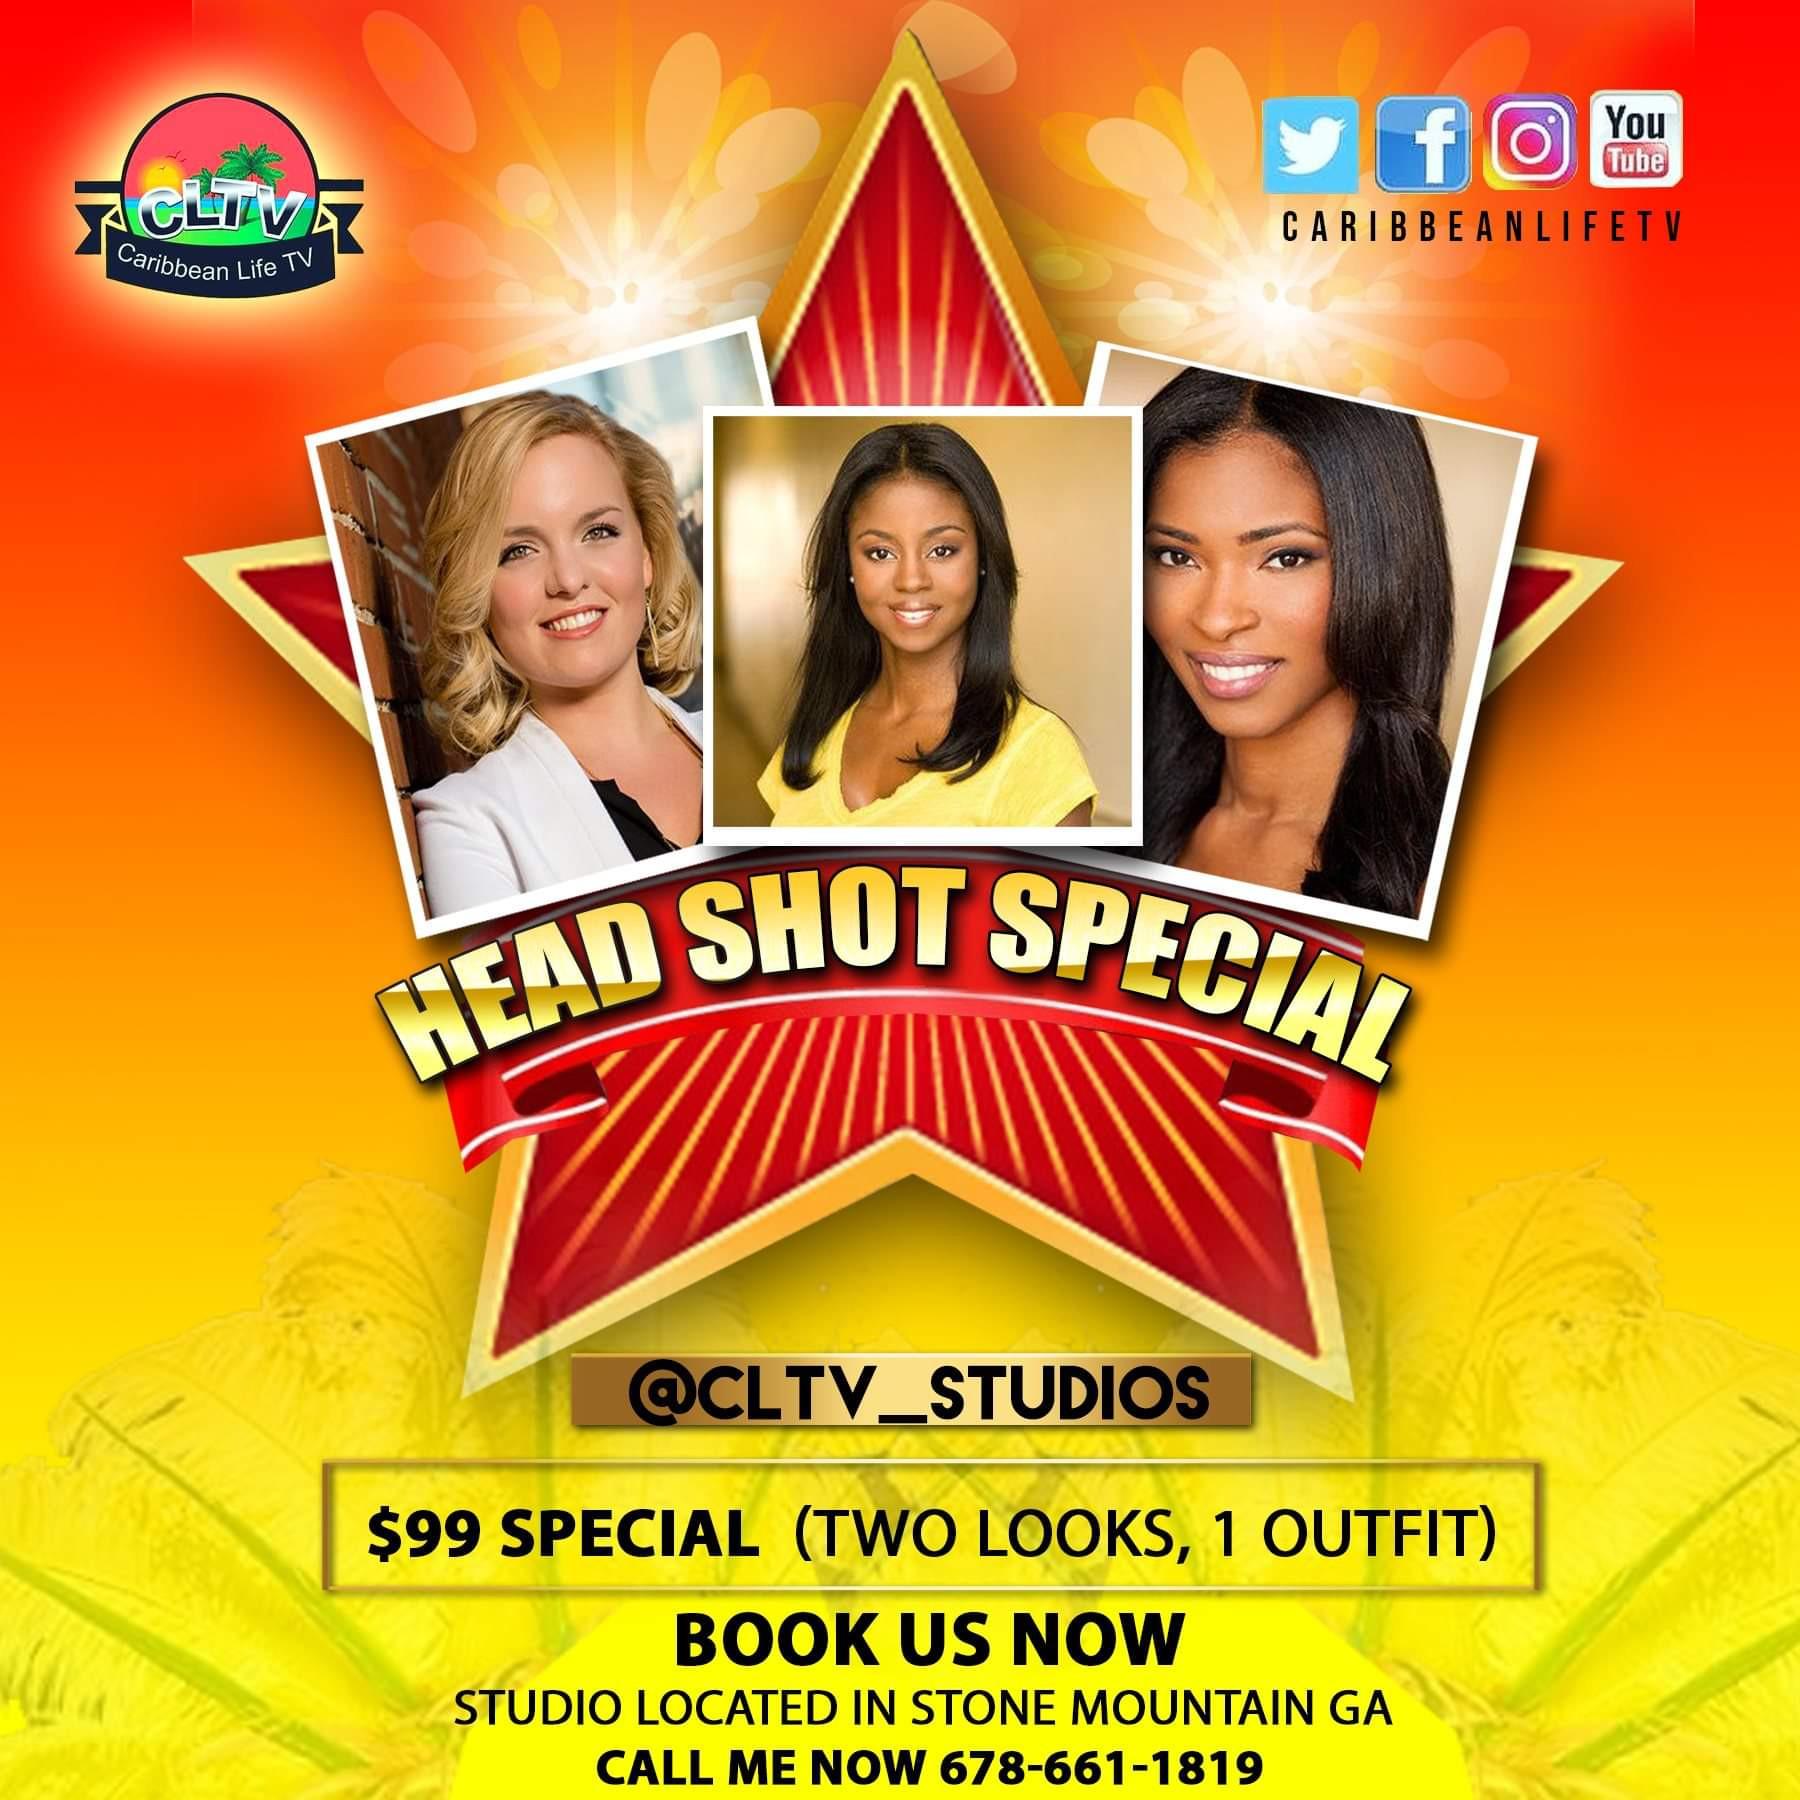 CLTV Studios Head Shot Special